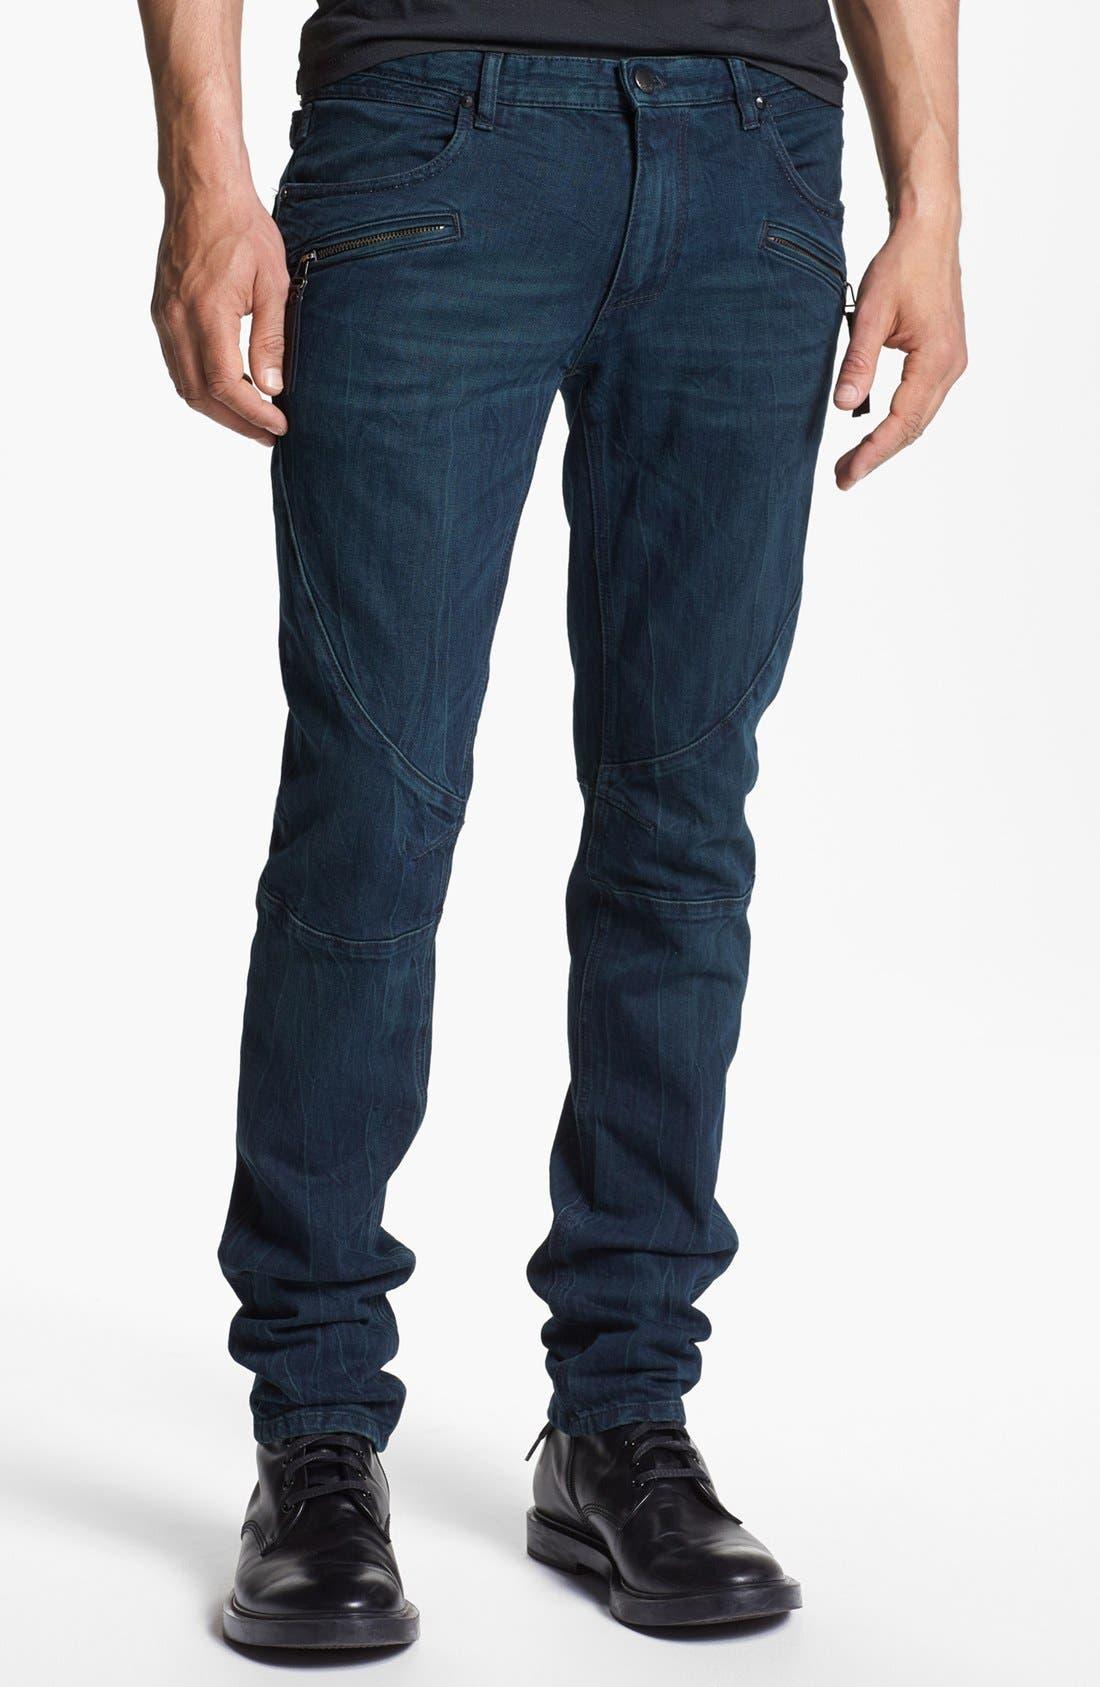 Alternate Image 1 Selected - Just Cavalli Slim Fit Moto Jeans